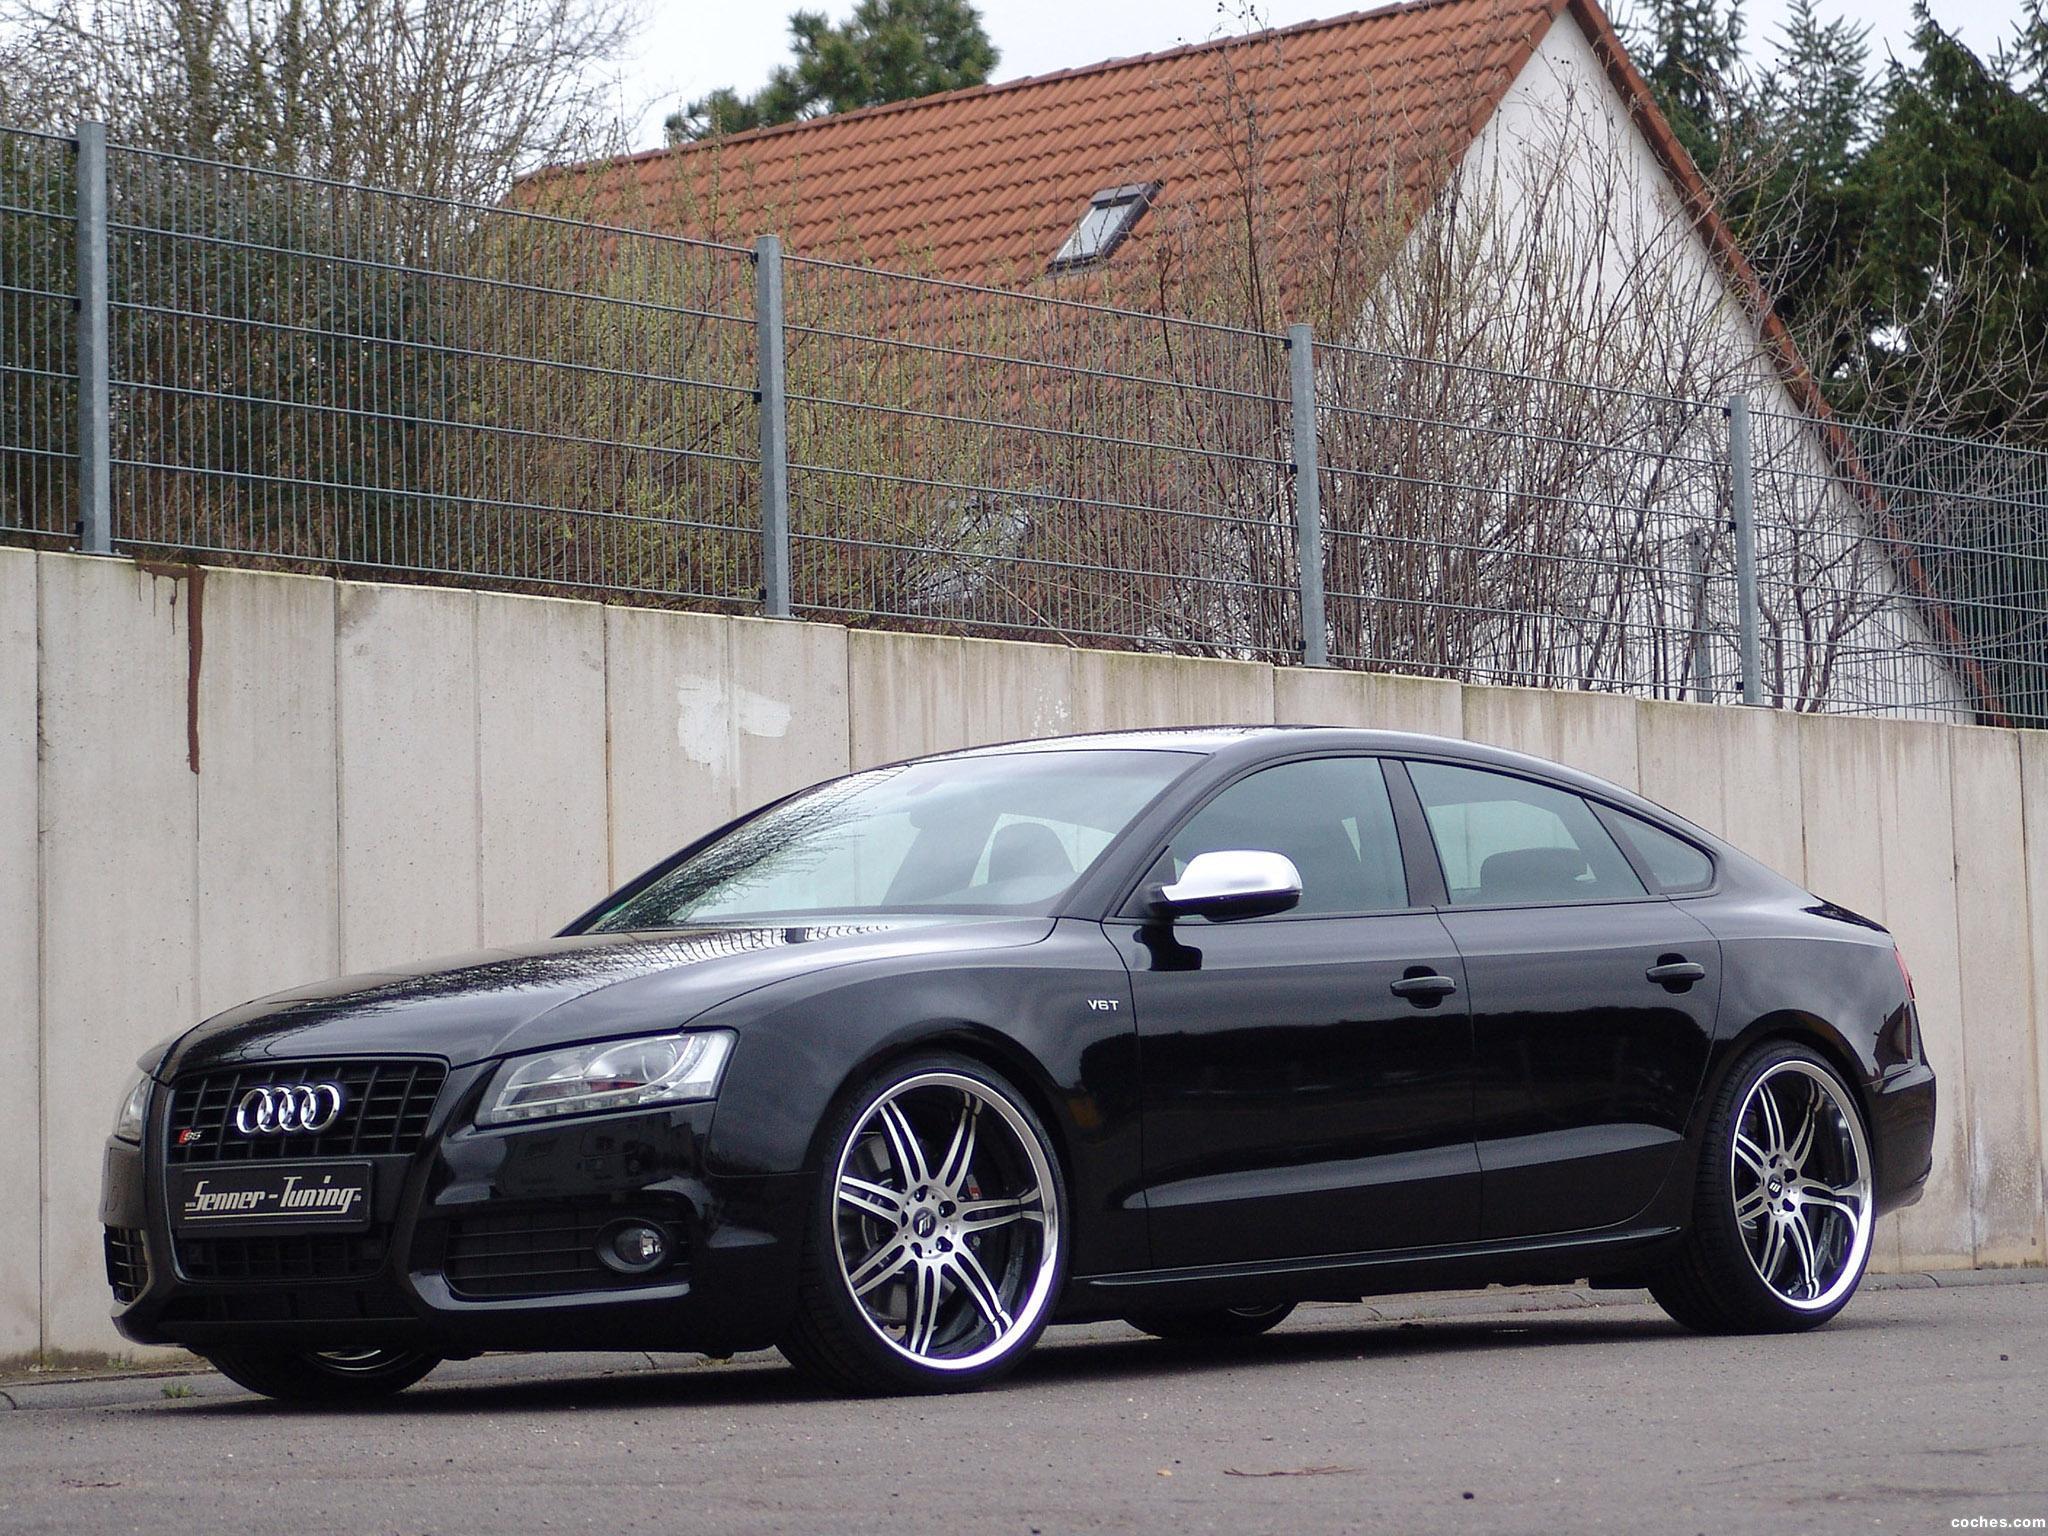 Foto 0 de Audi Senner S5 Sportback 2011